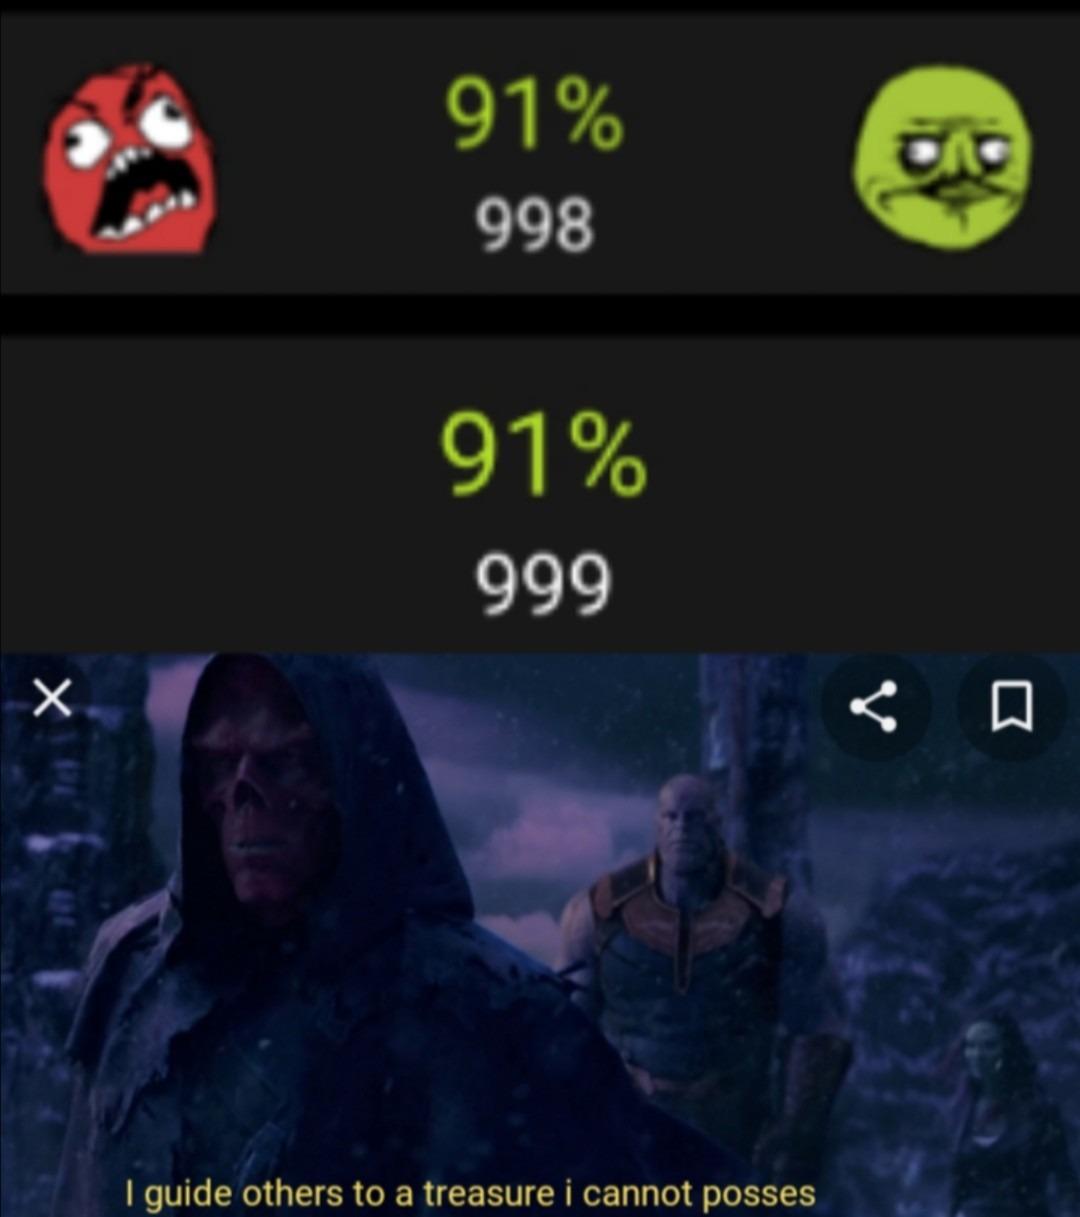 Just one more shitpost - meme